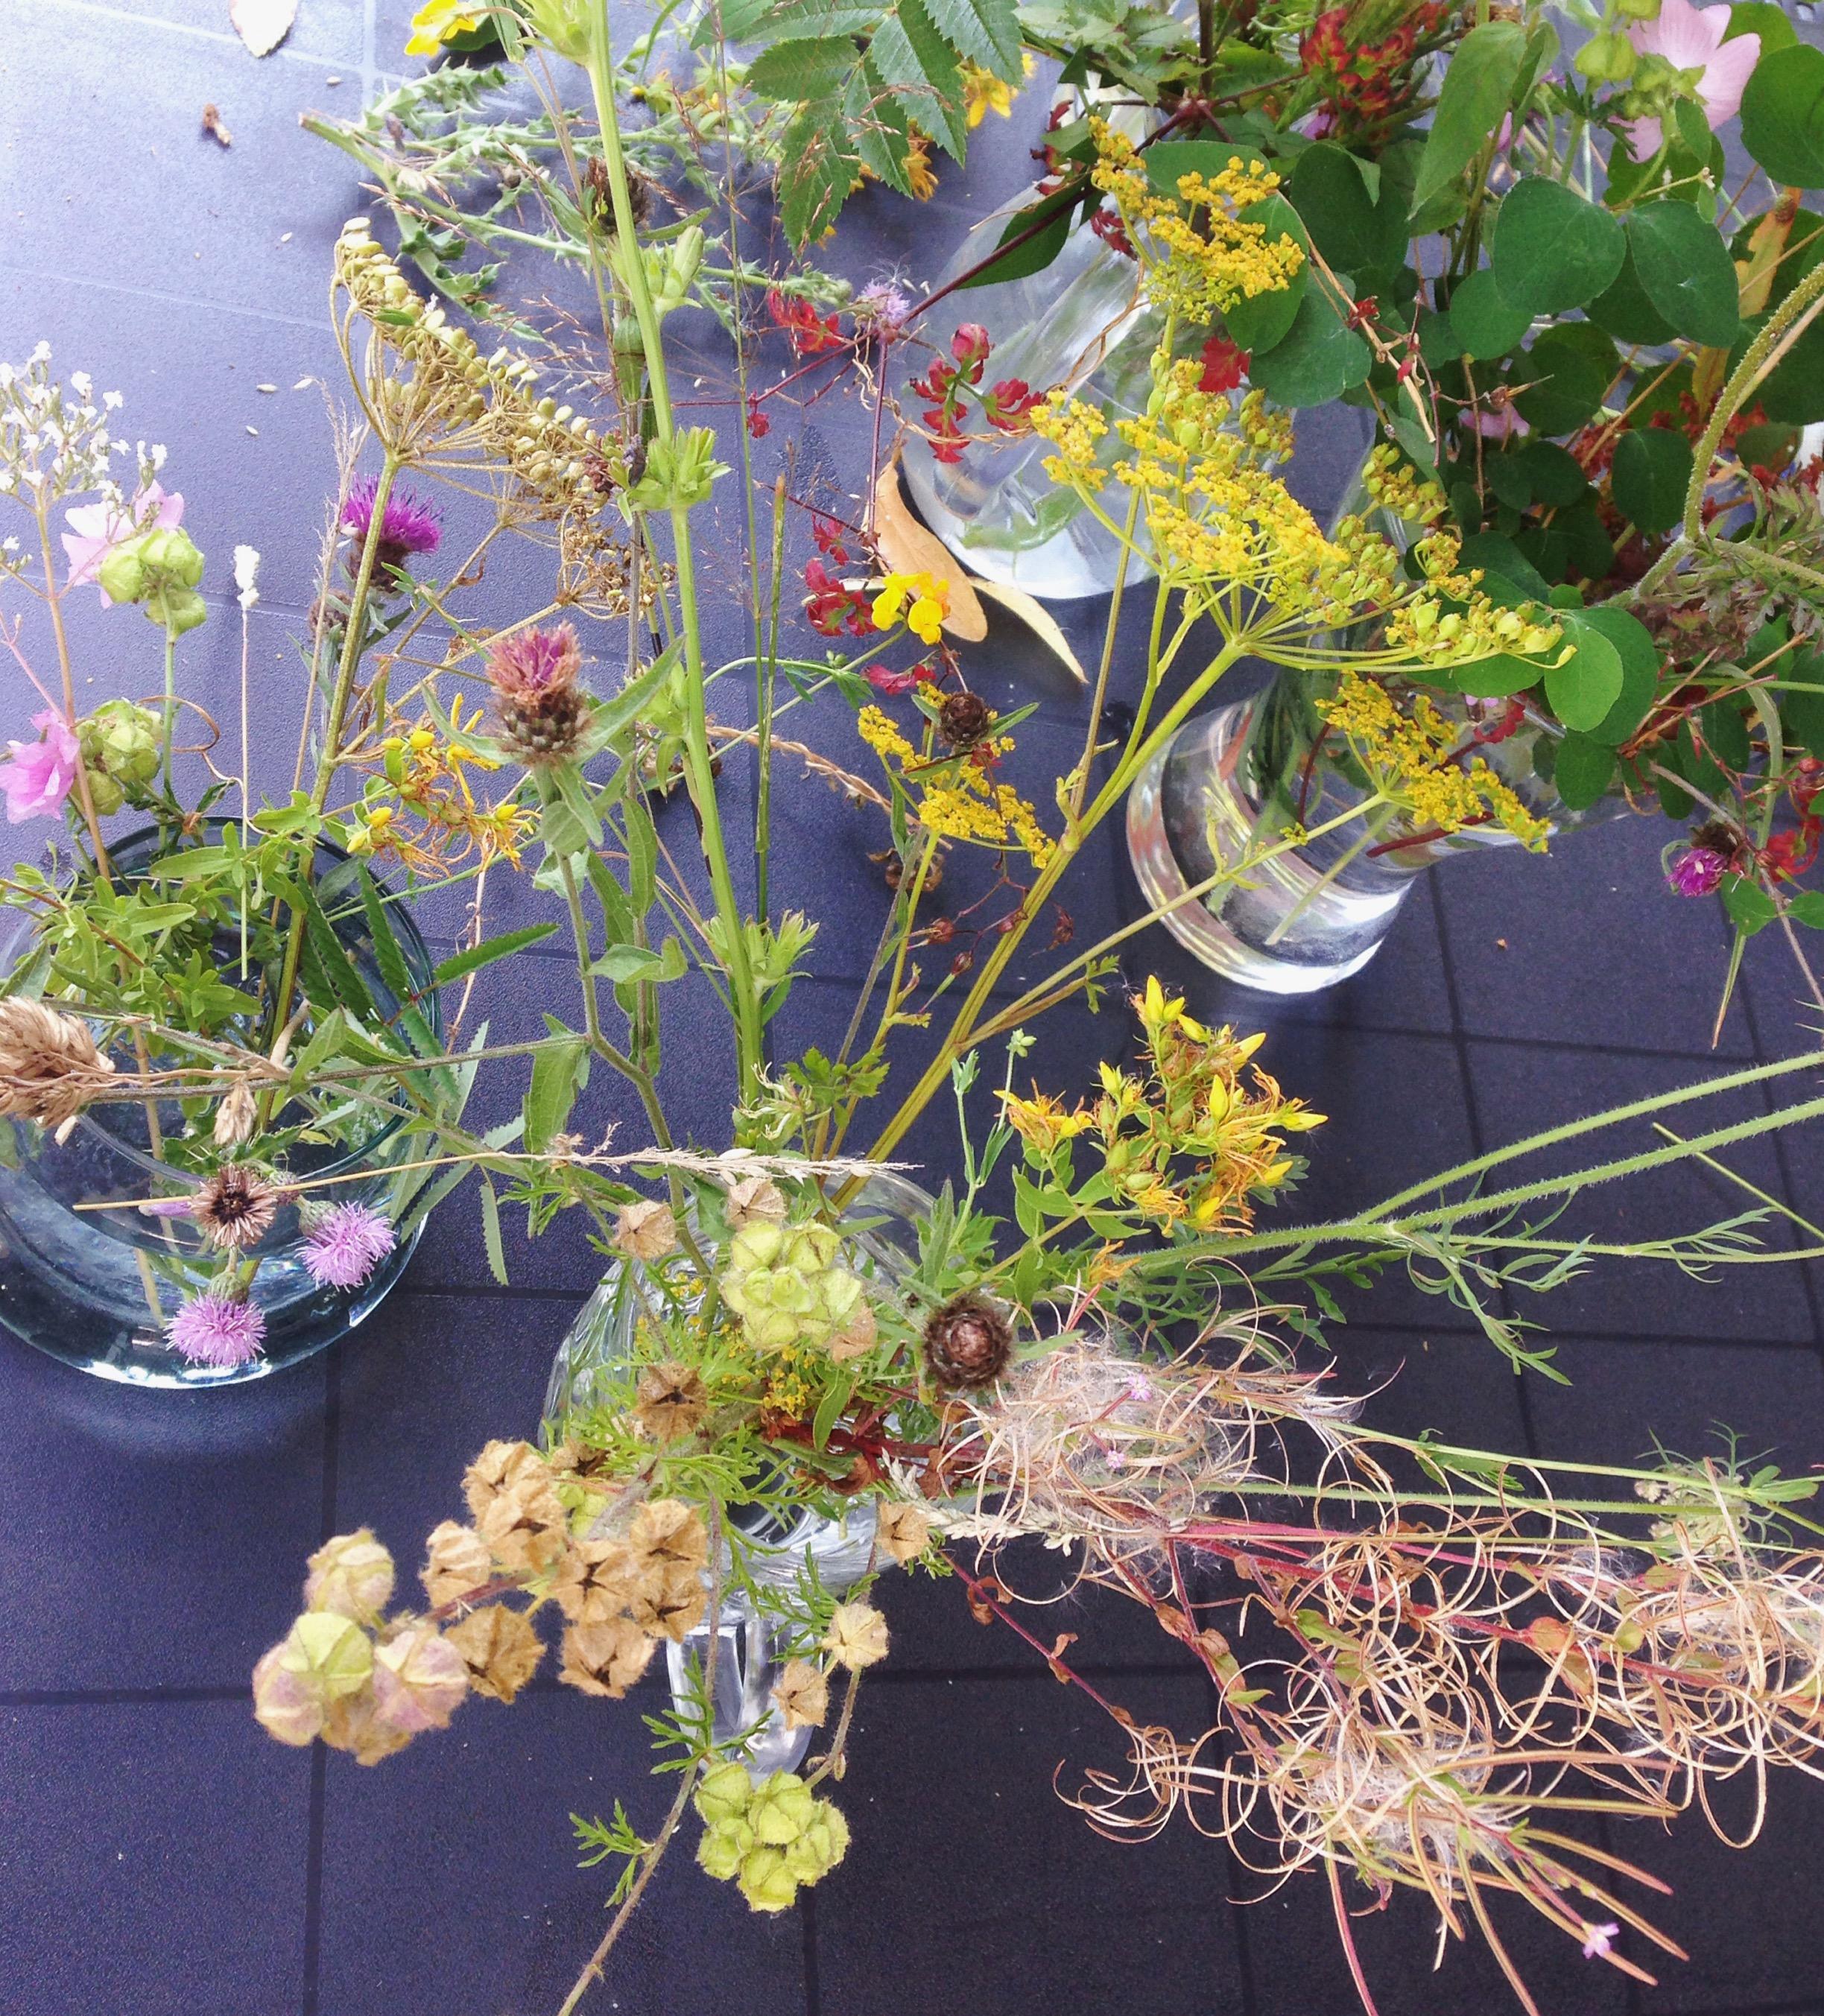 Botanicals photo by Lindsay McDonagh